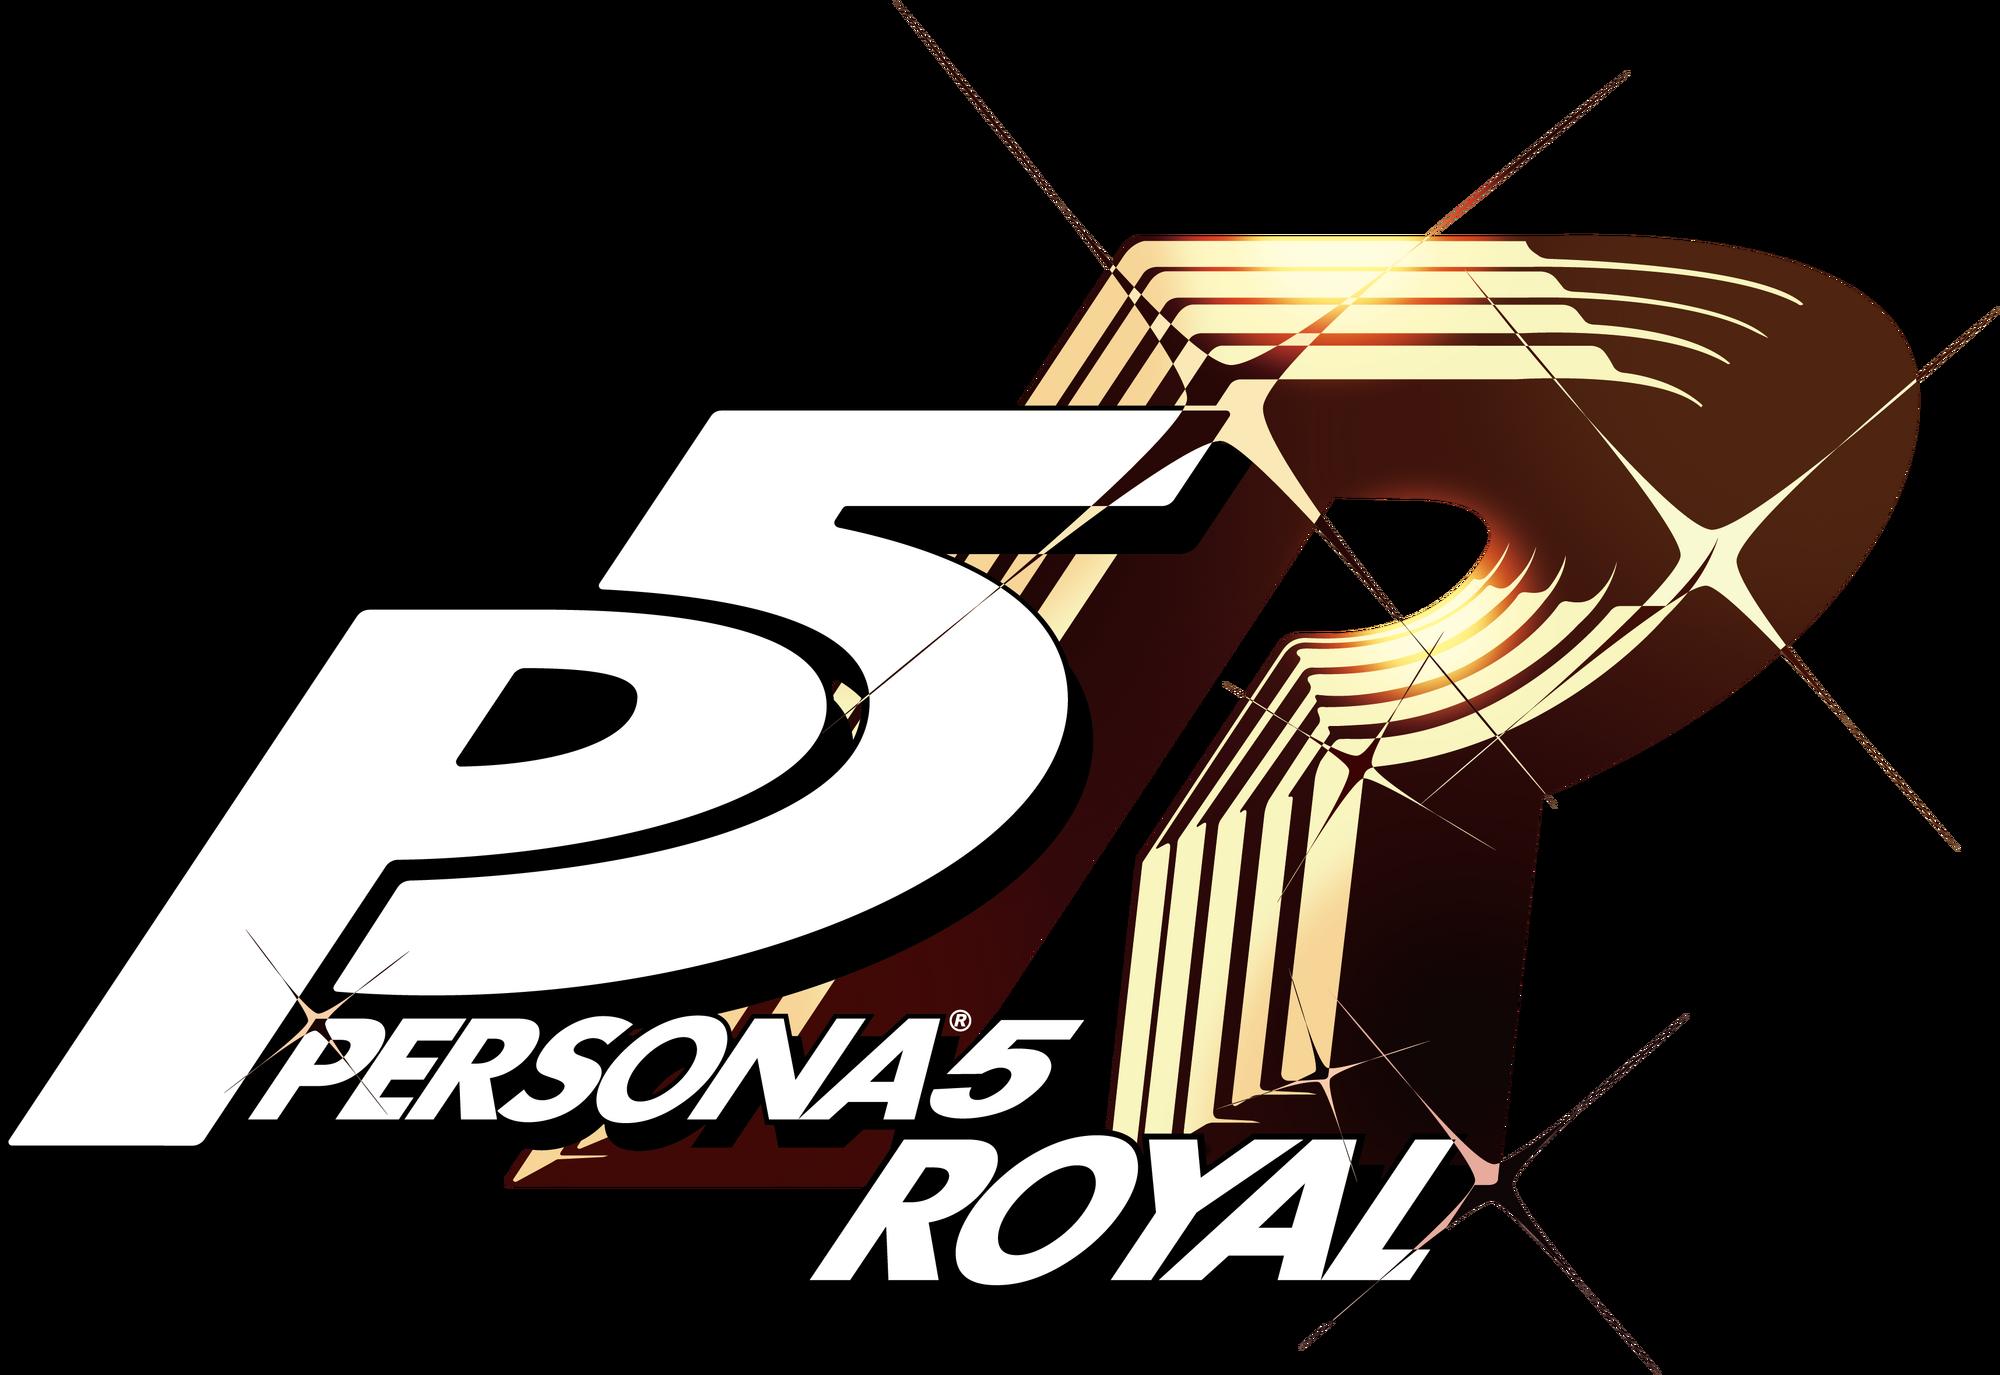 Persona 5 Royal | Shin Megami Tensei Online | Fandom